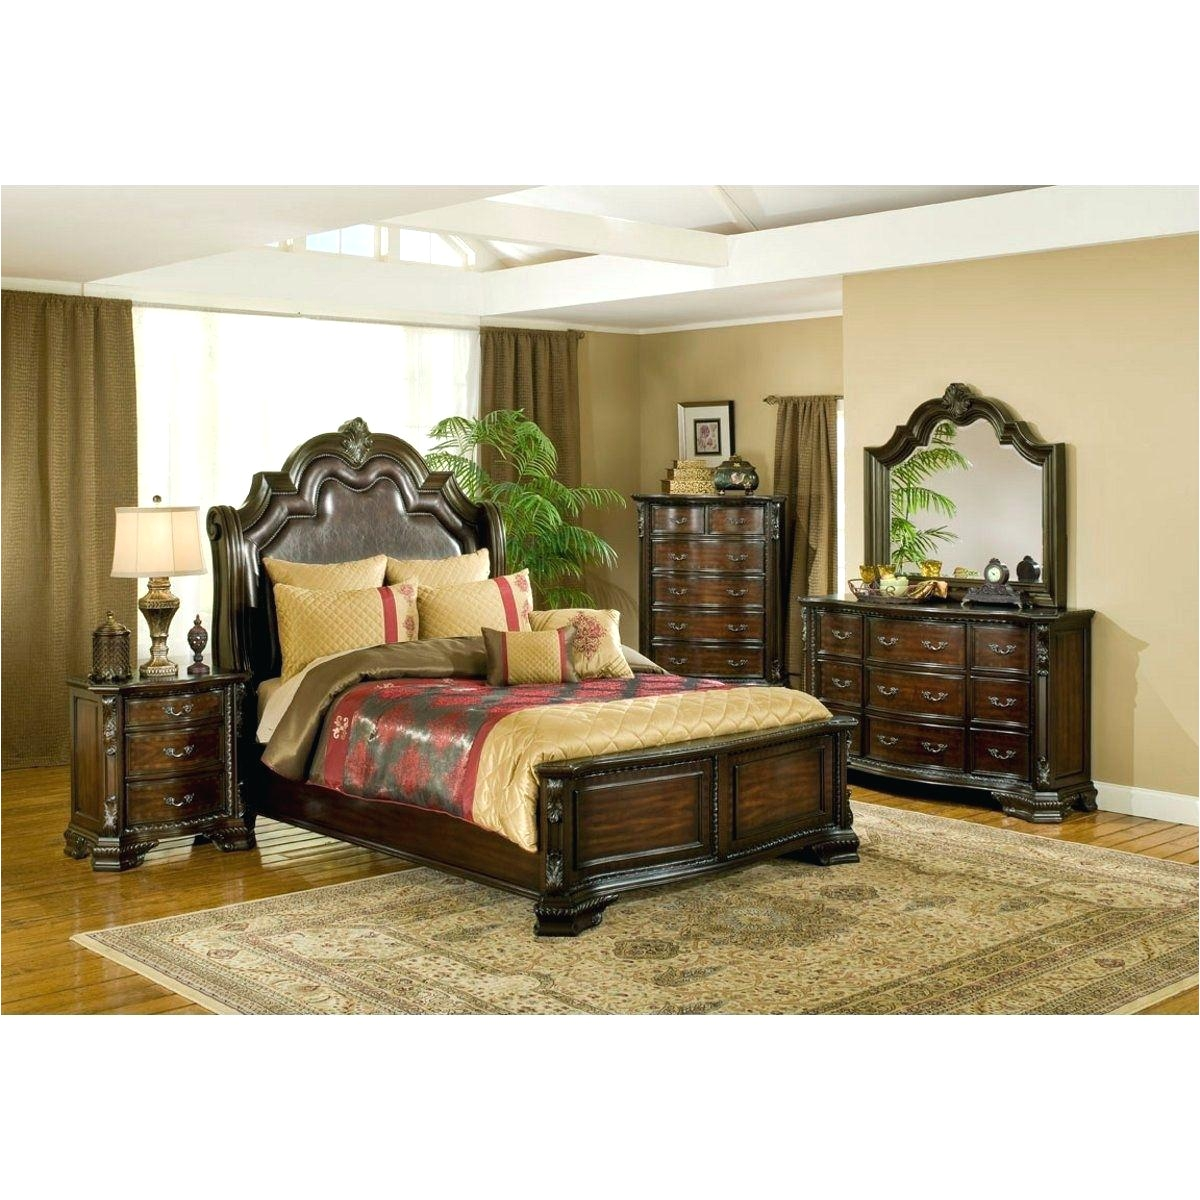 ponderosa furniture el paso tx king bedroom sets furniture the mattress store luxury bedroom furniture top